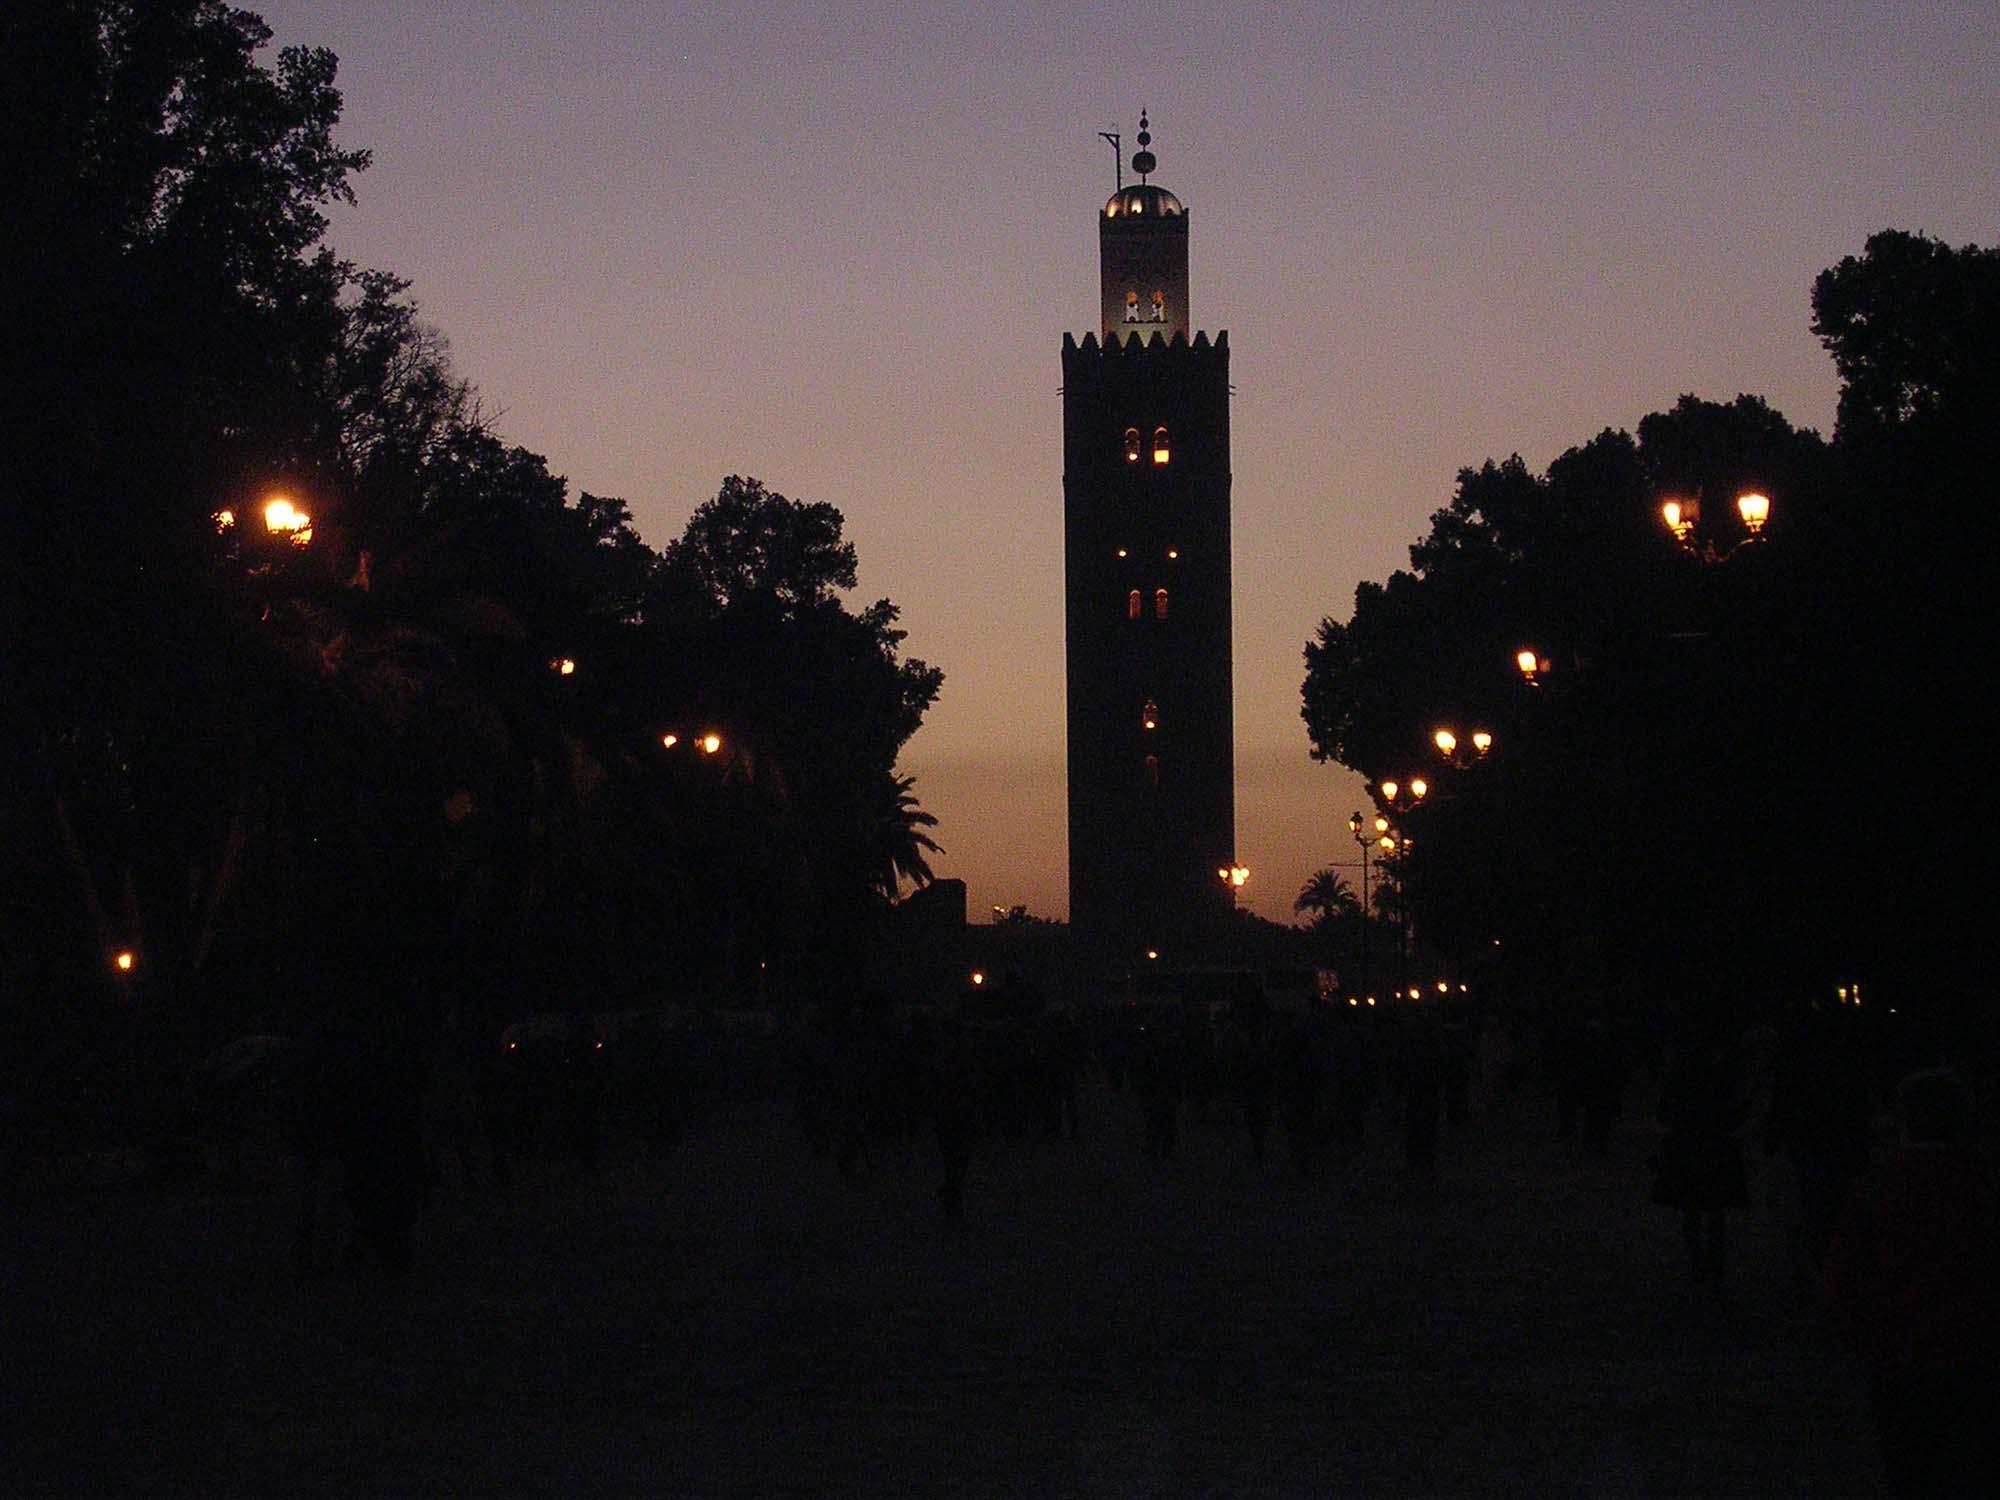 Marocco - Marrakech - la Koutoubia